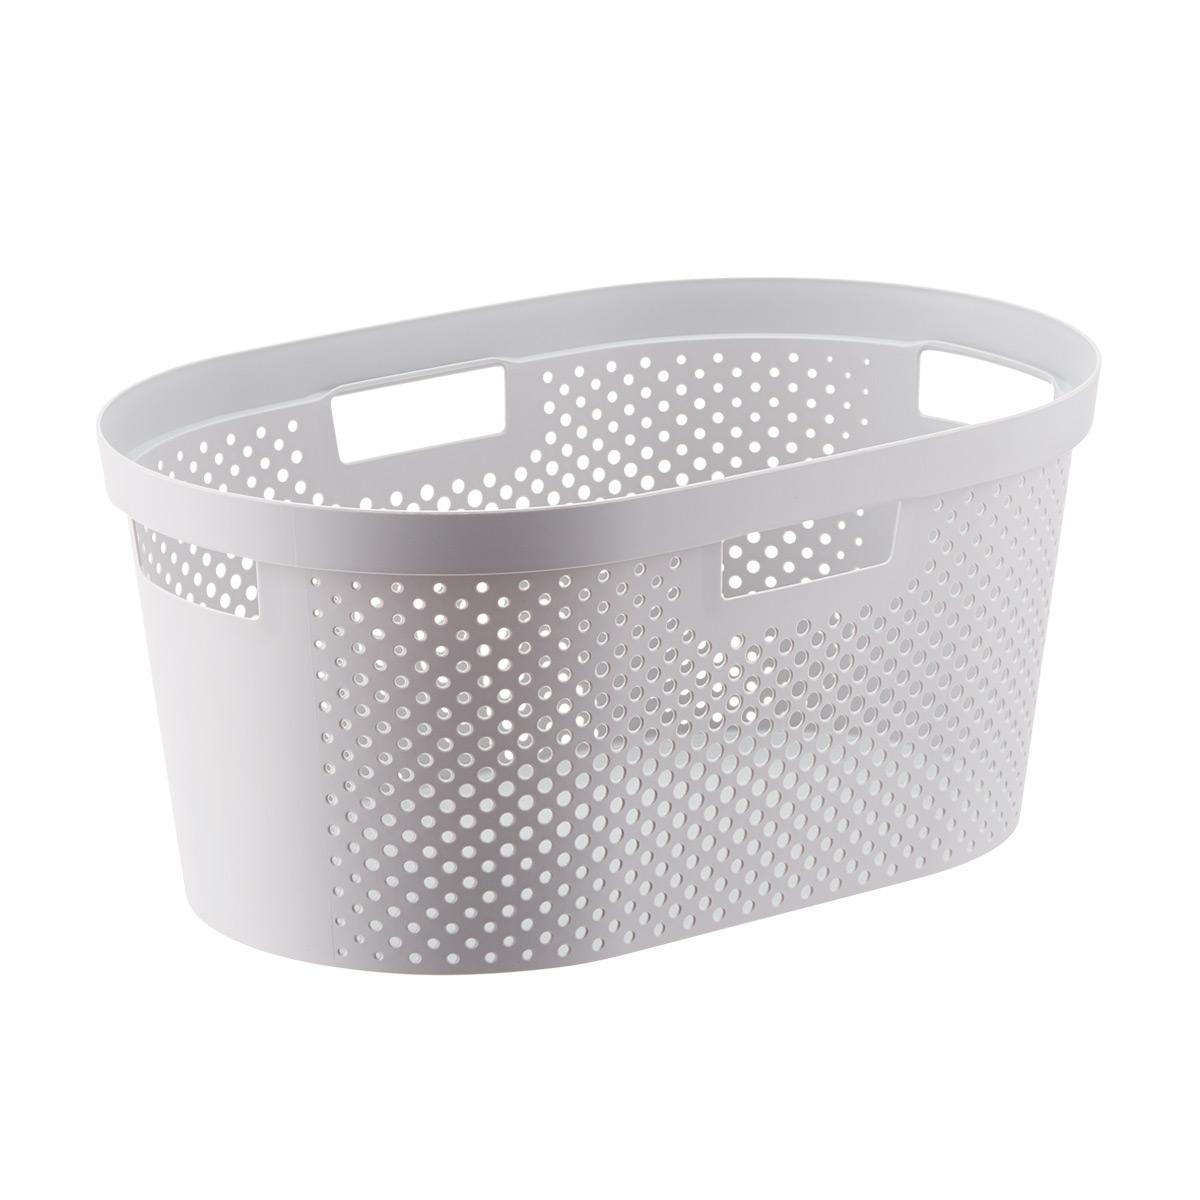 Infinity Laundry Basket